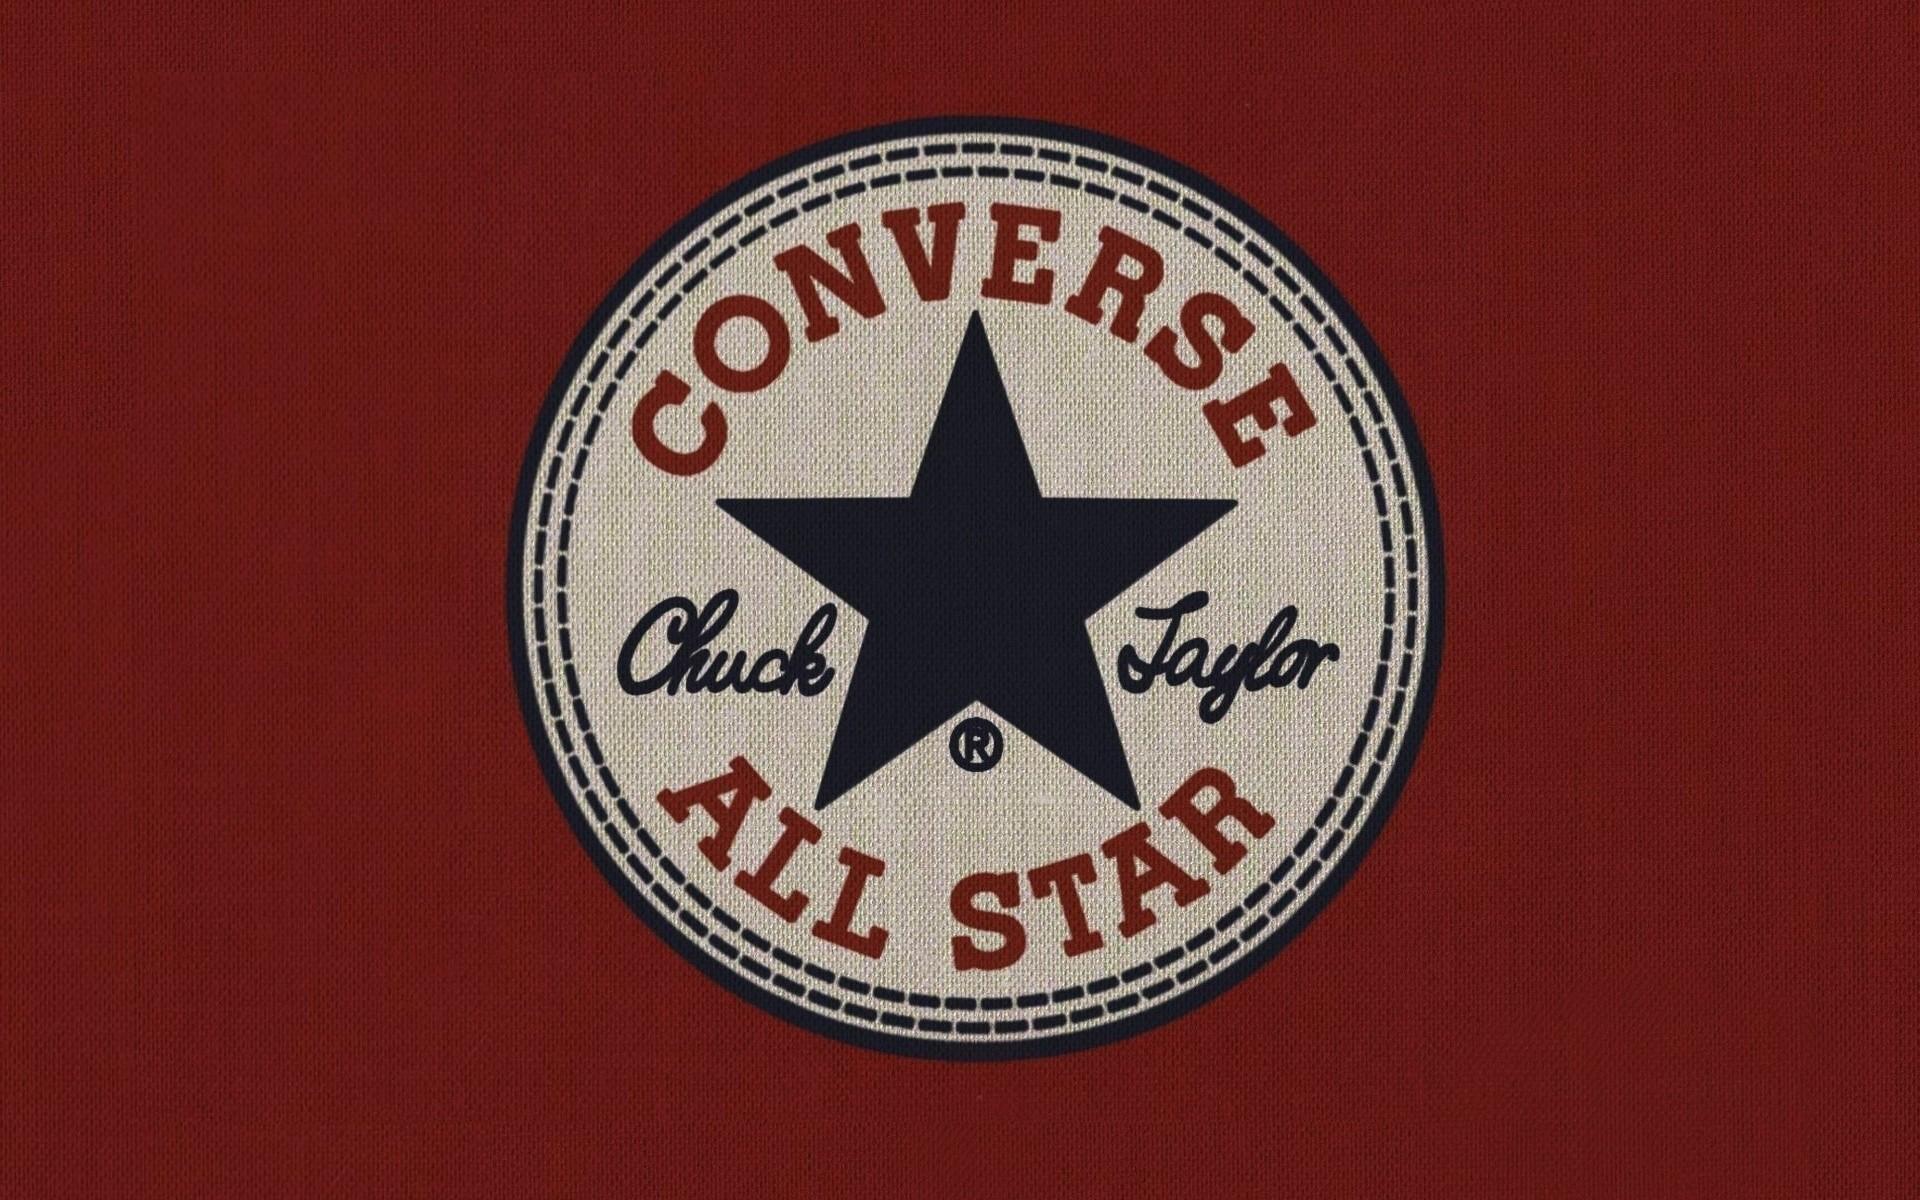 Brands_Converse_brand_shoes_099964_.jpg (1920×1200) | Brands ...